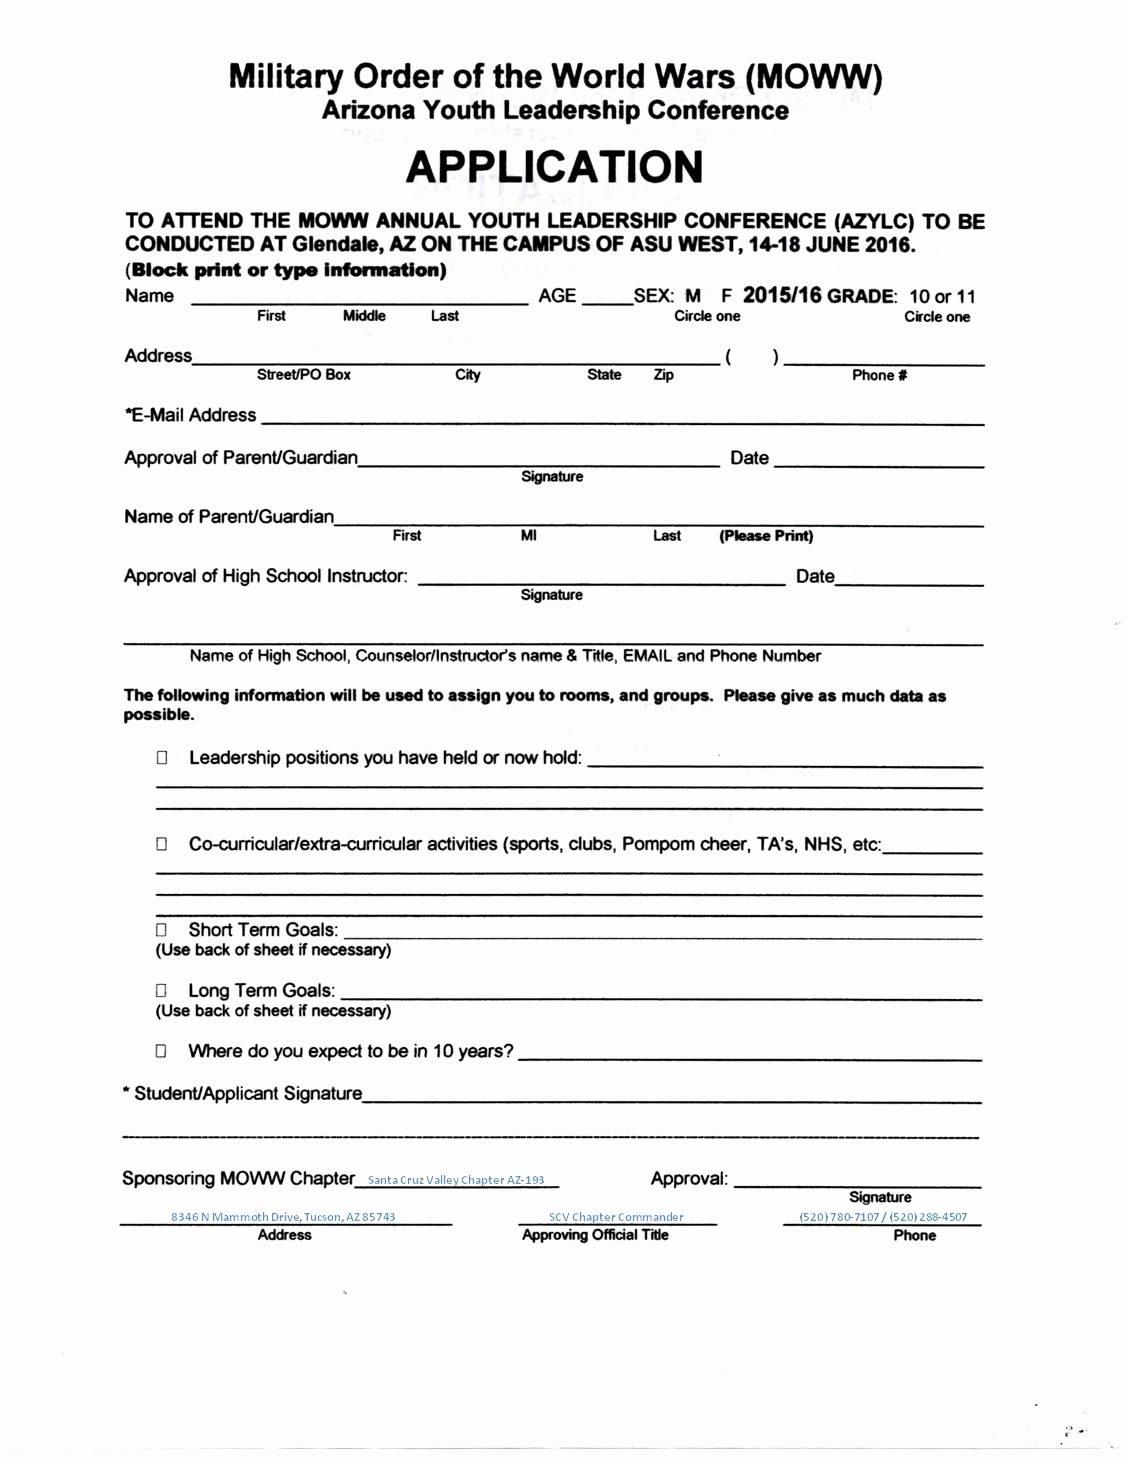 Summer Camp Registration form Sample Fresh Arizona Youth Leadership Conference Summer Program